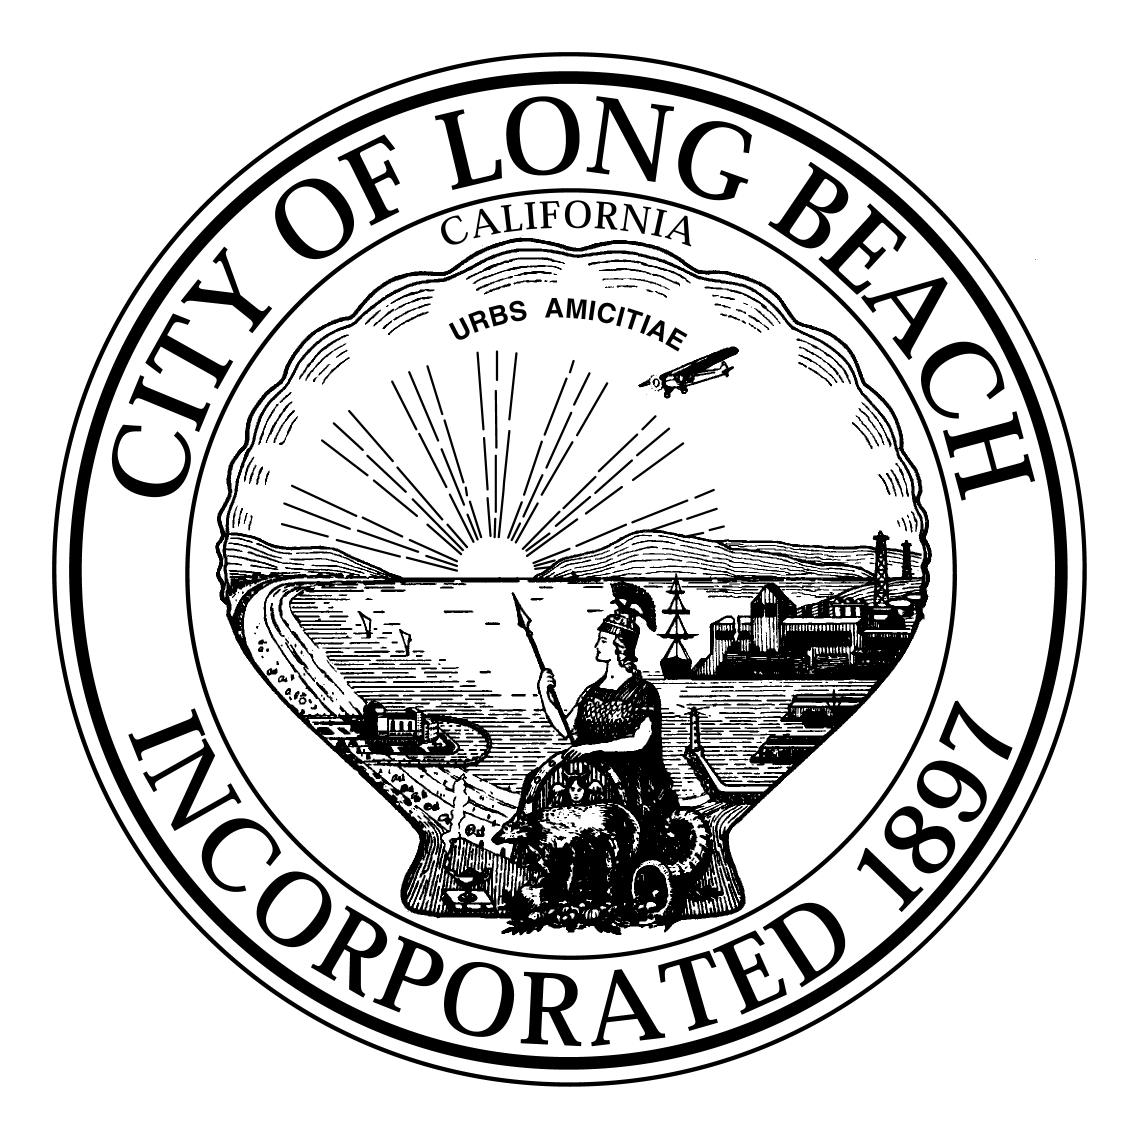 city of long beach logo2.jpg